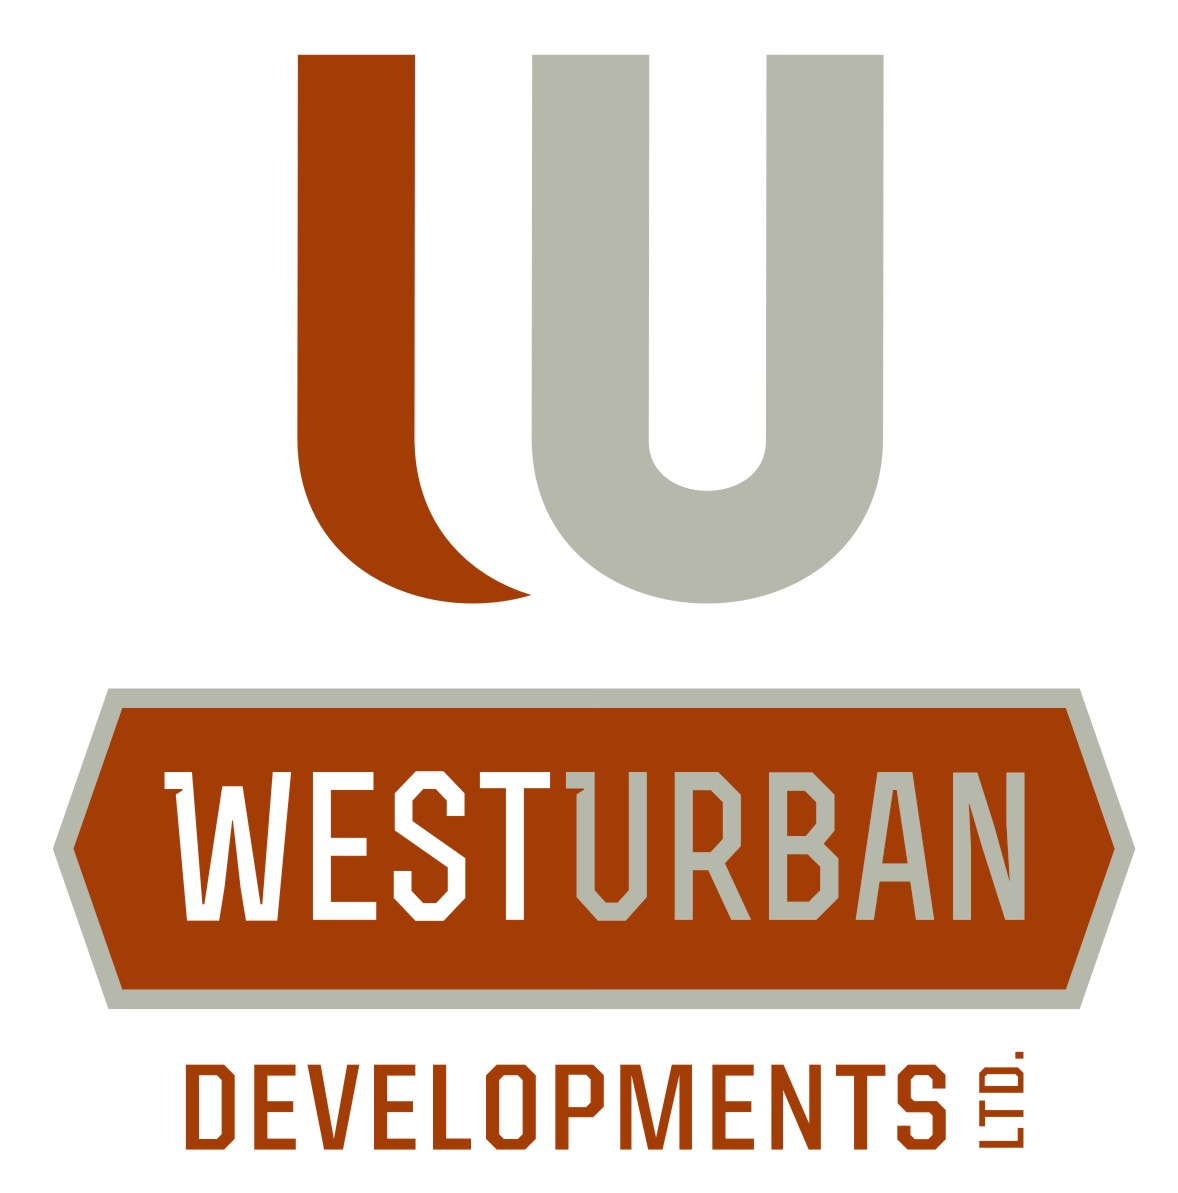 WestUrban-Developments-Ltd.-Vertical-Wordmark-3.jpg